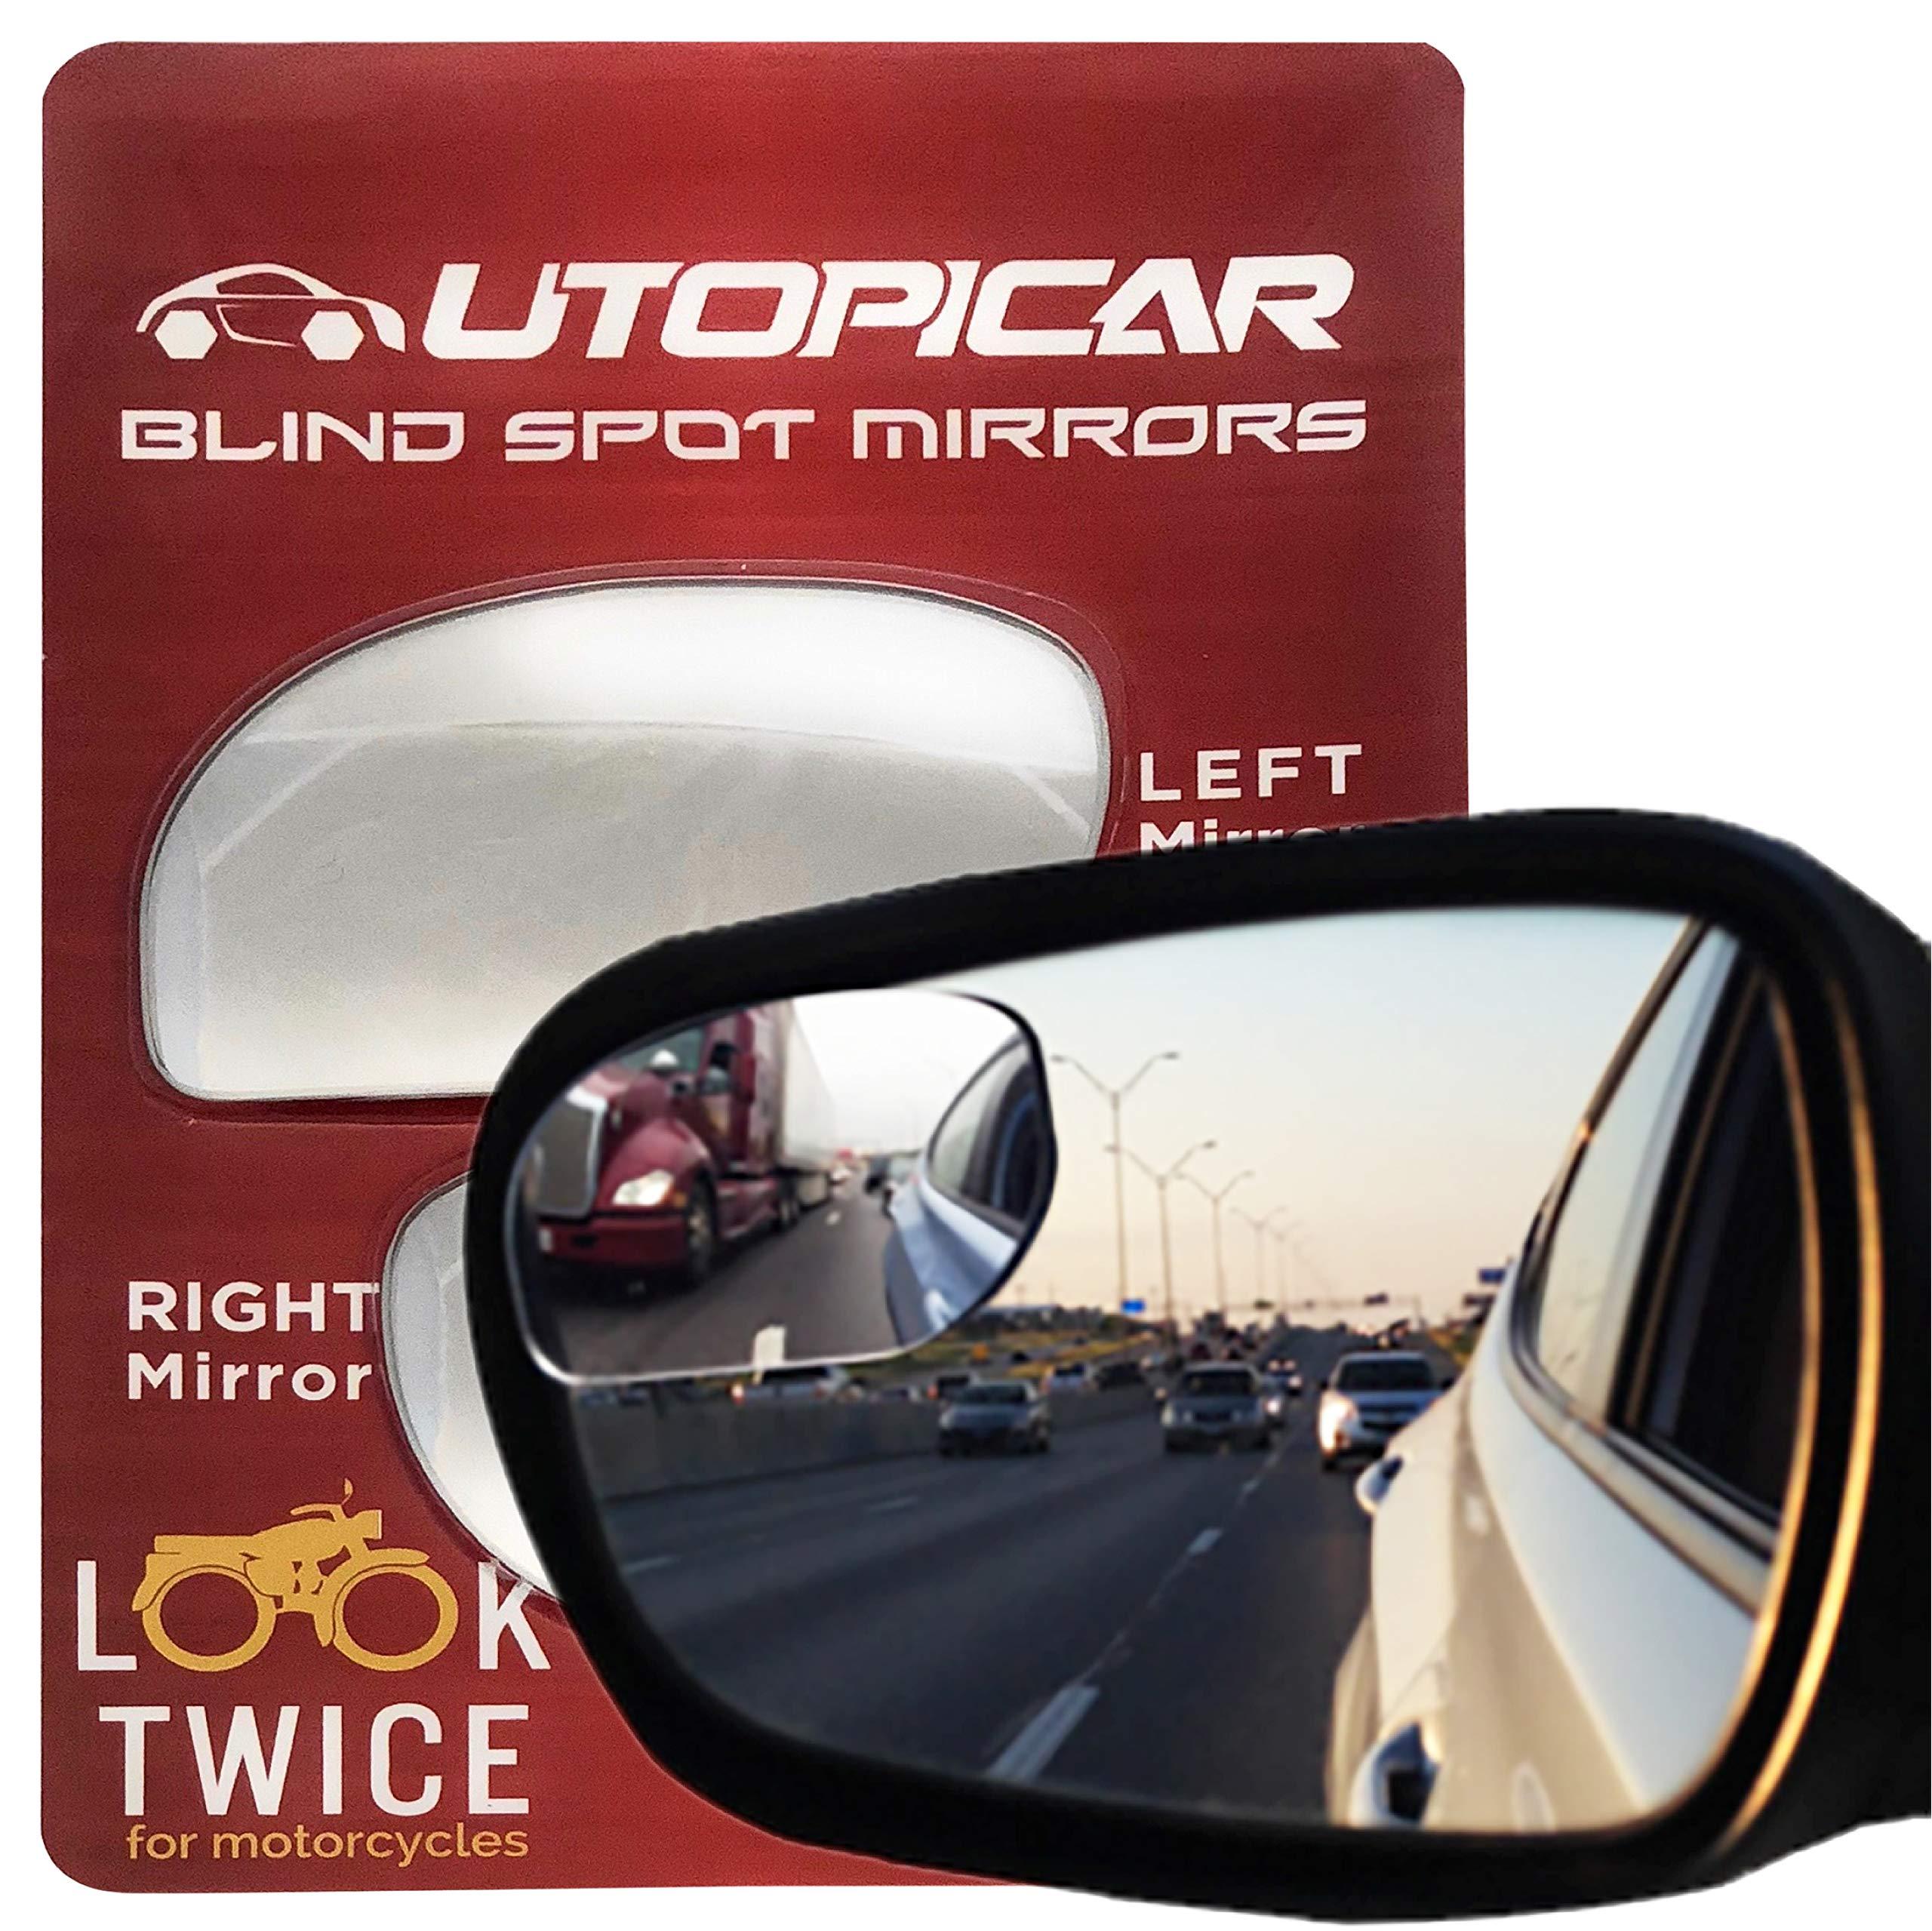 Utopicar Blind Spot Mirrors Unique Design Car Door